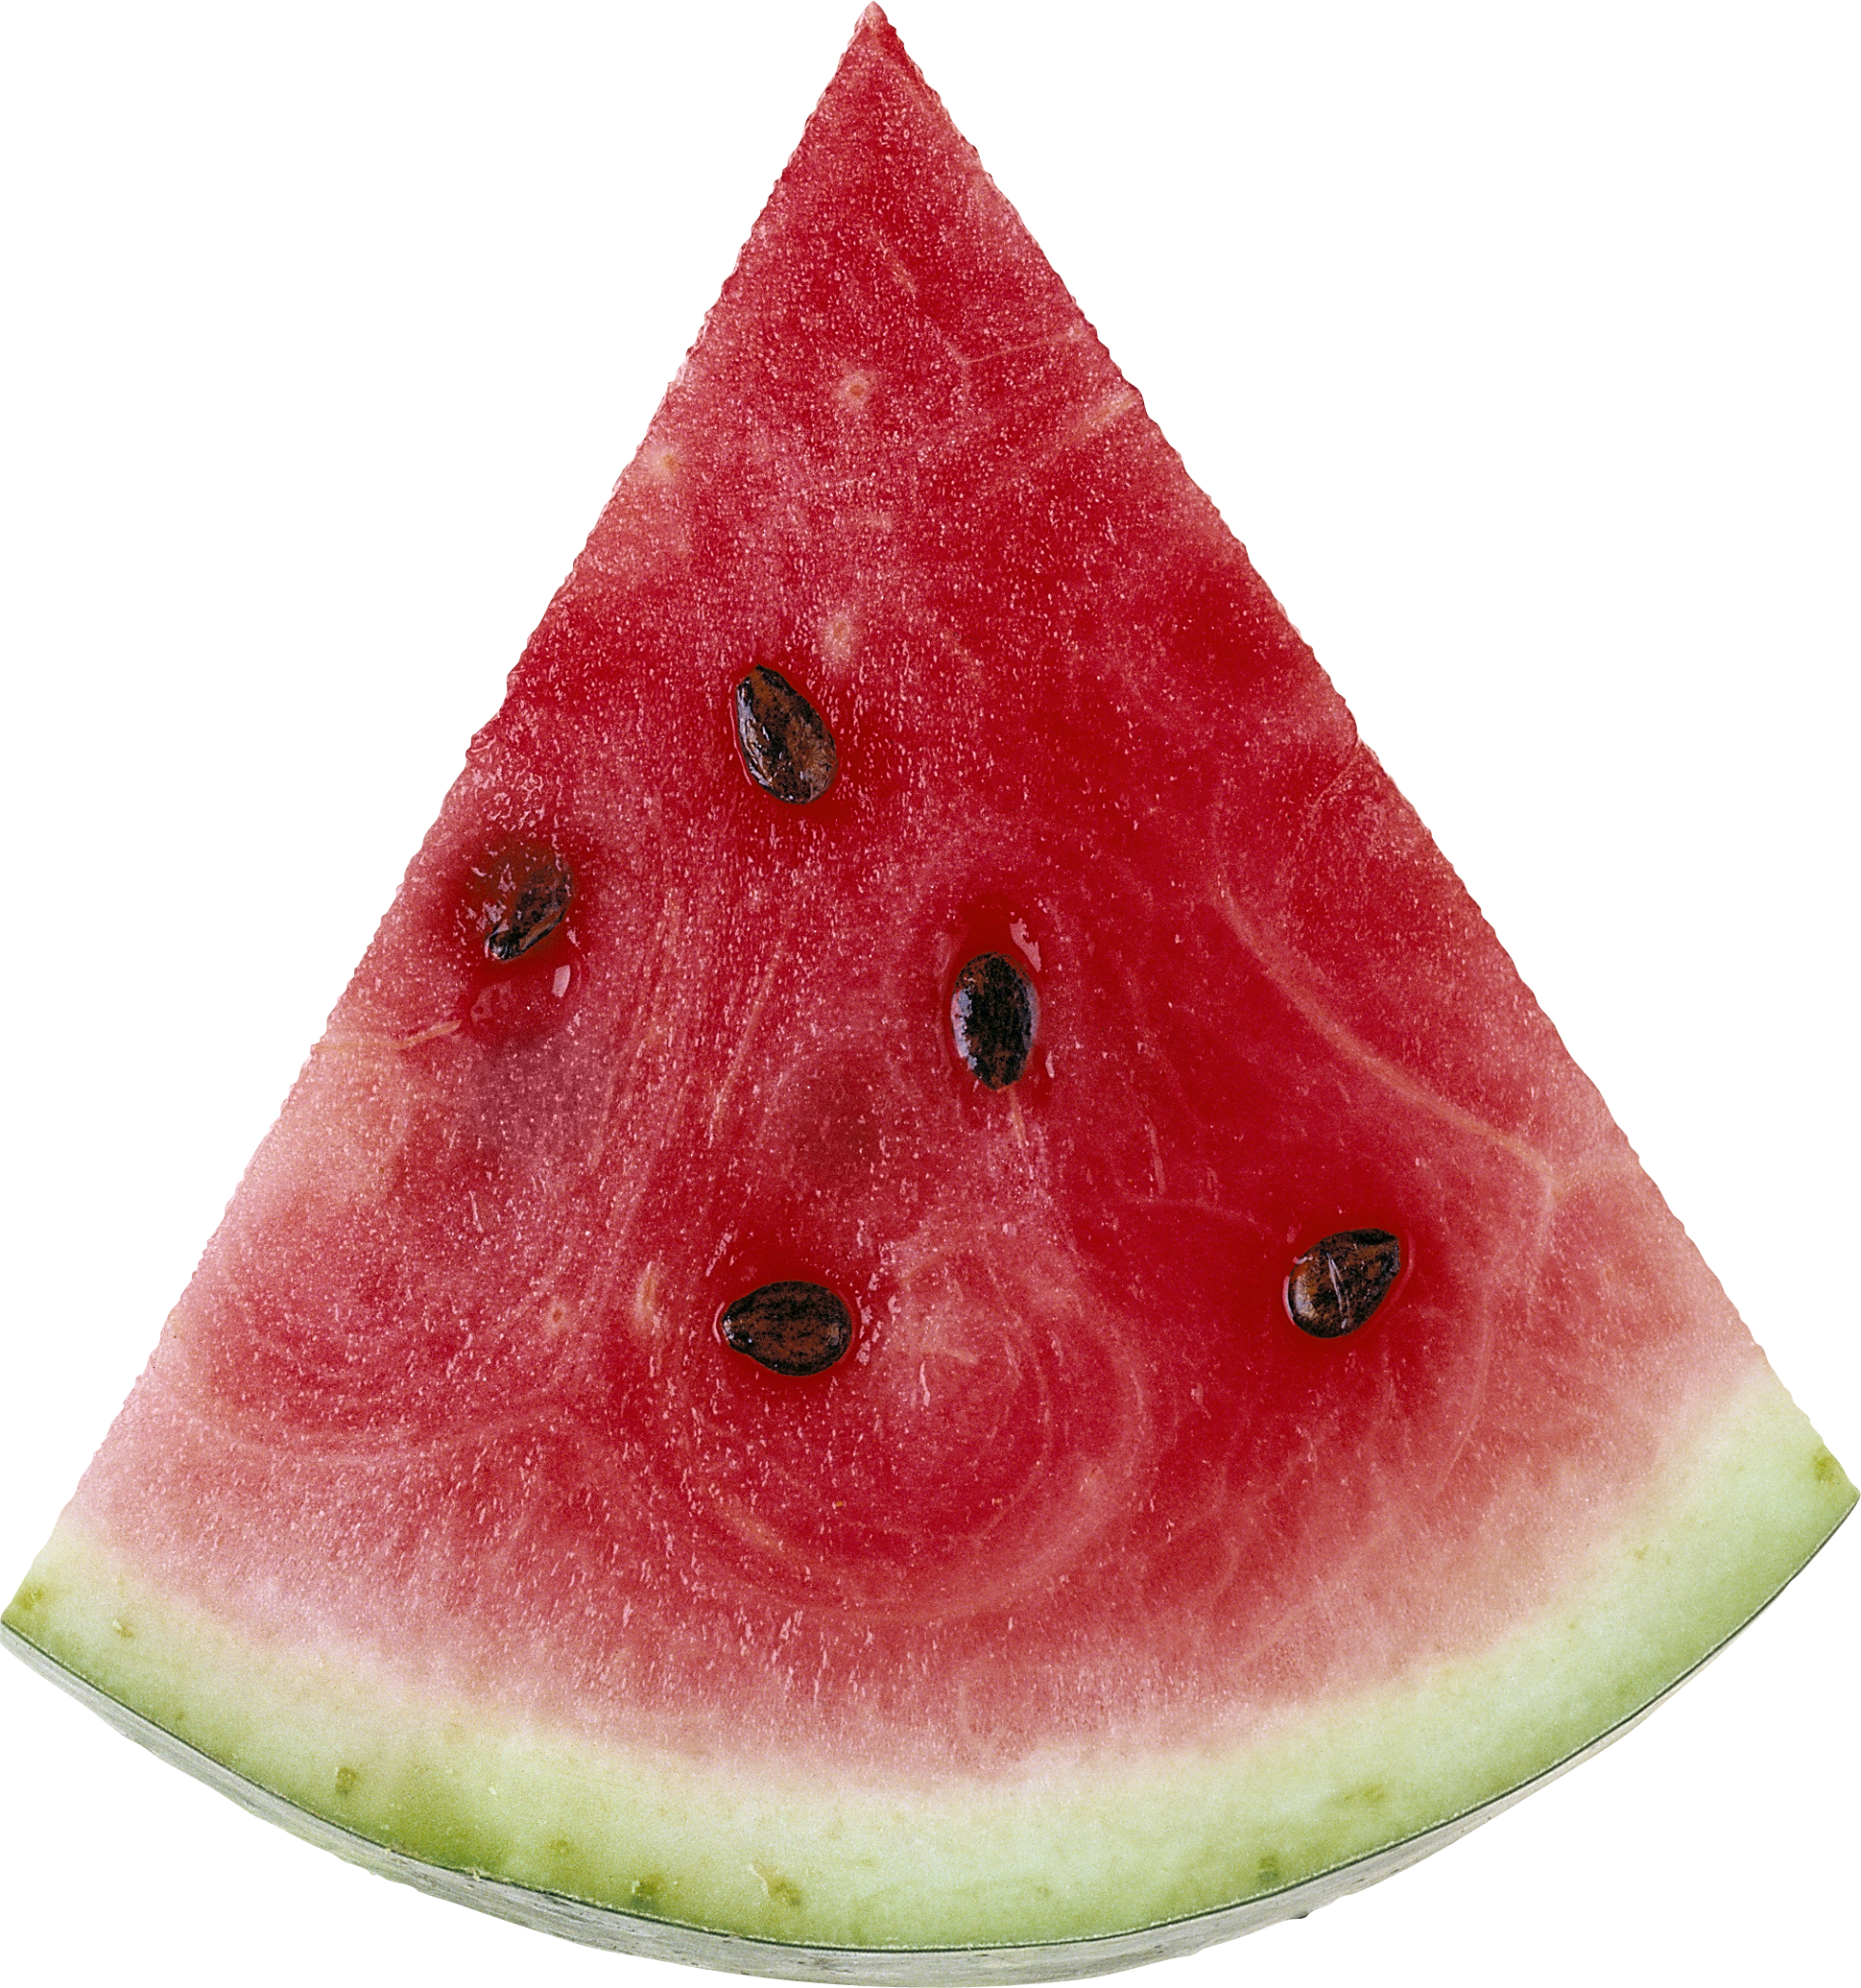 Watermelon clipart transparent food Watermelon free download image watermelon